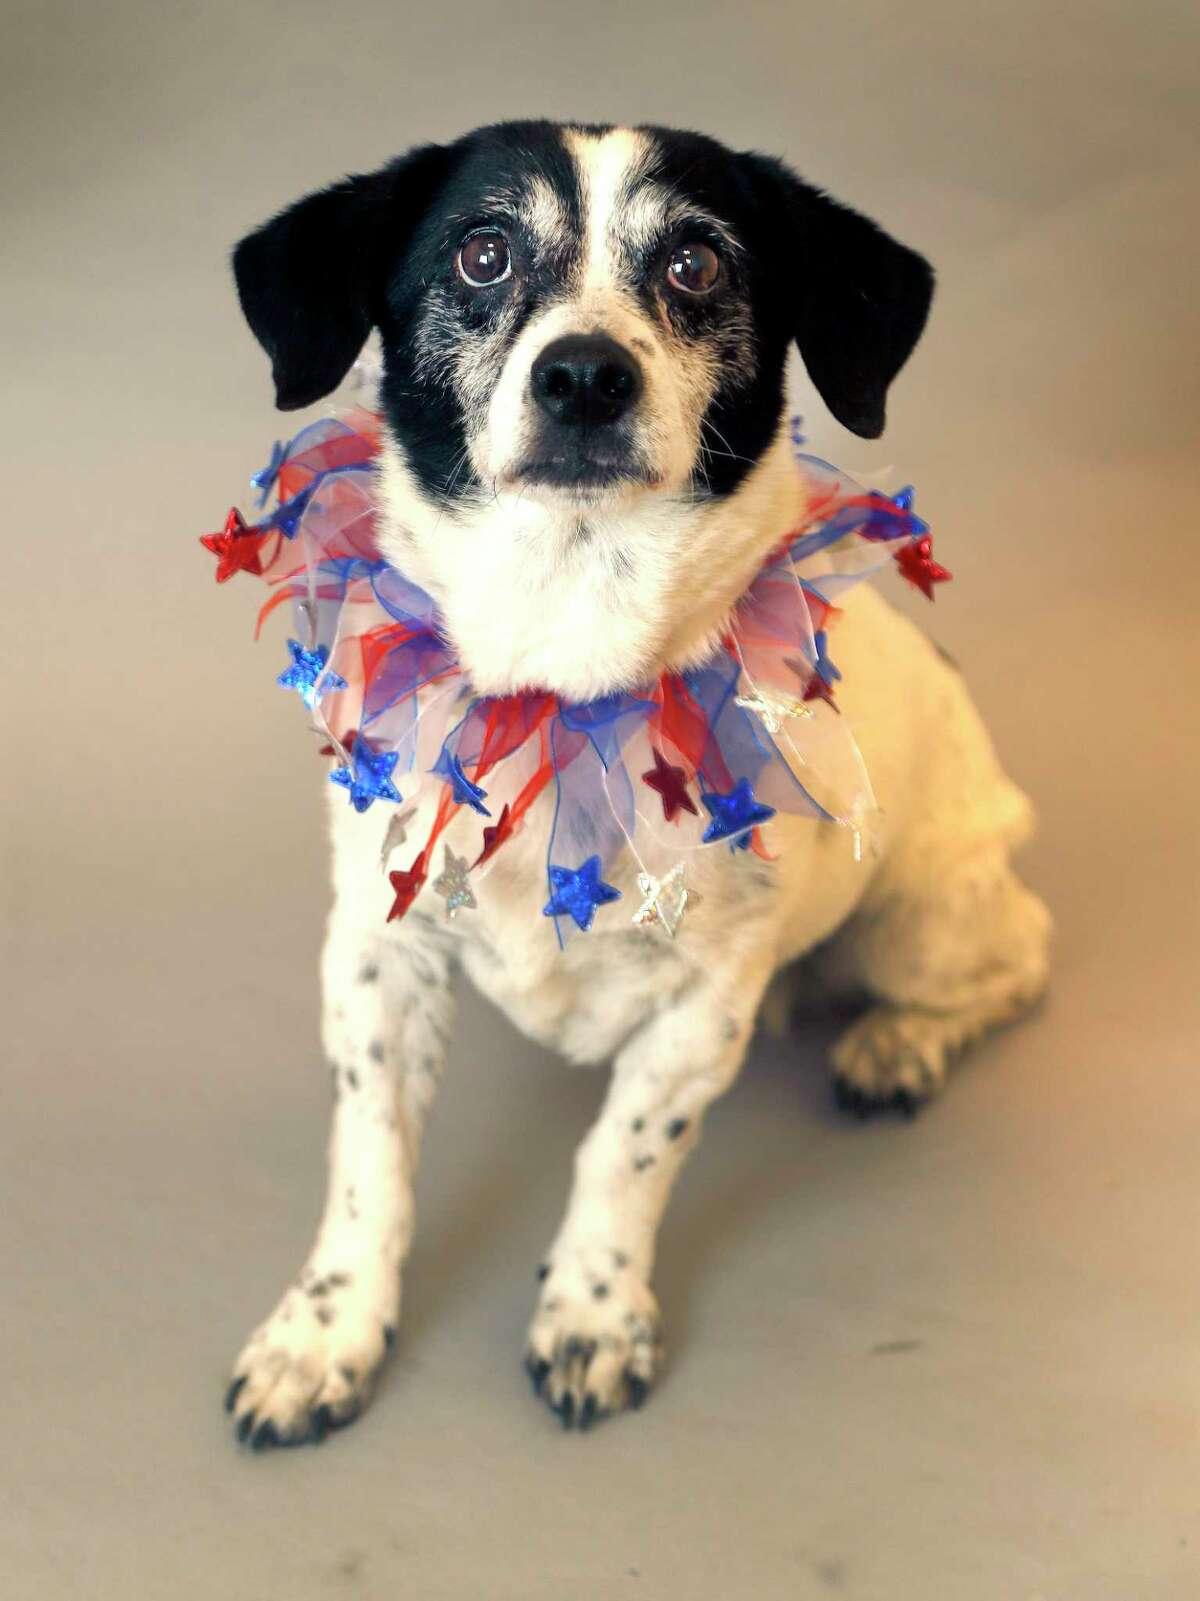 November is 'Adopt a Senior Dog